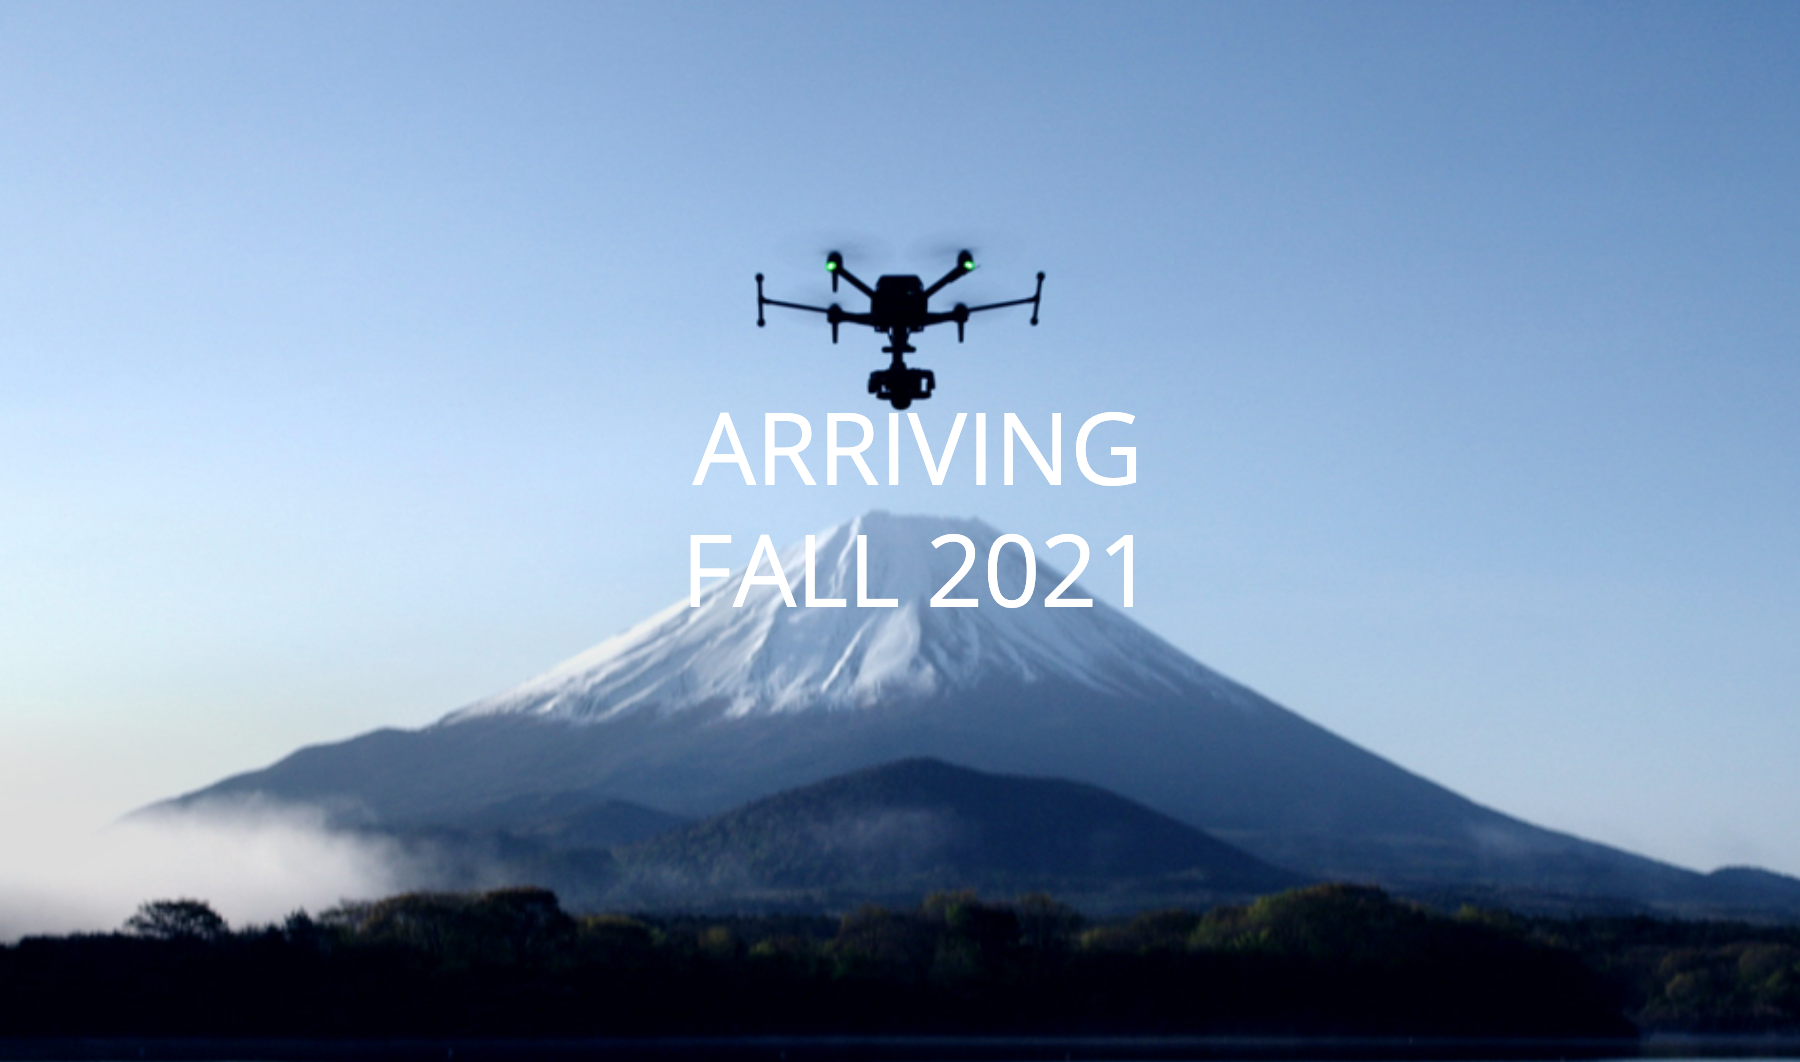 Sony 宣佈推 Airpeak S1 無人機 可搭載 Alph 無反相機 定價 9000 美元